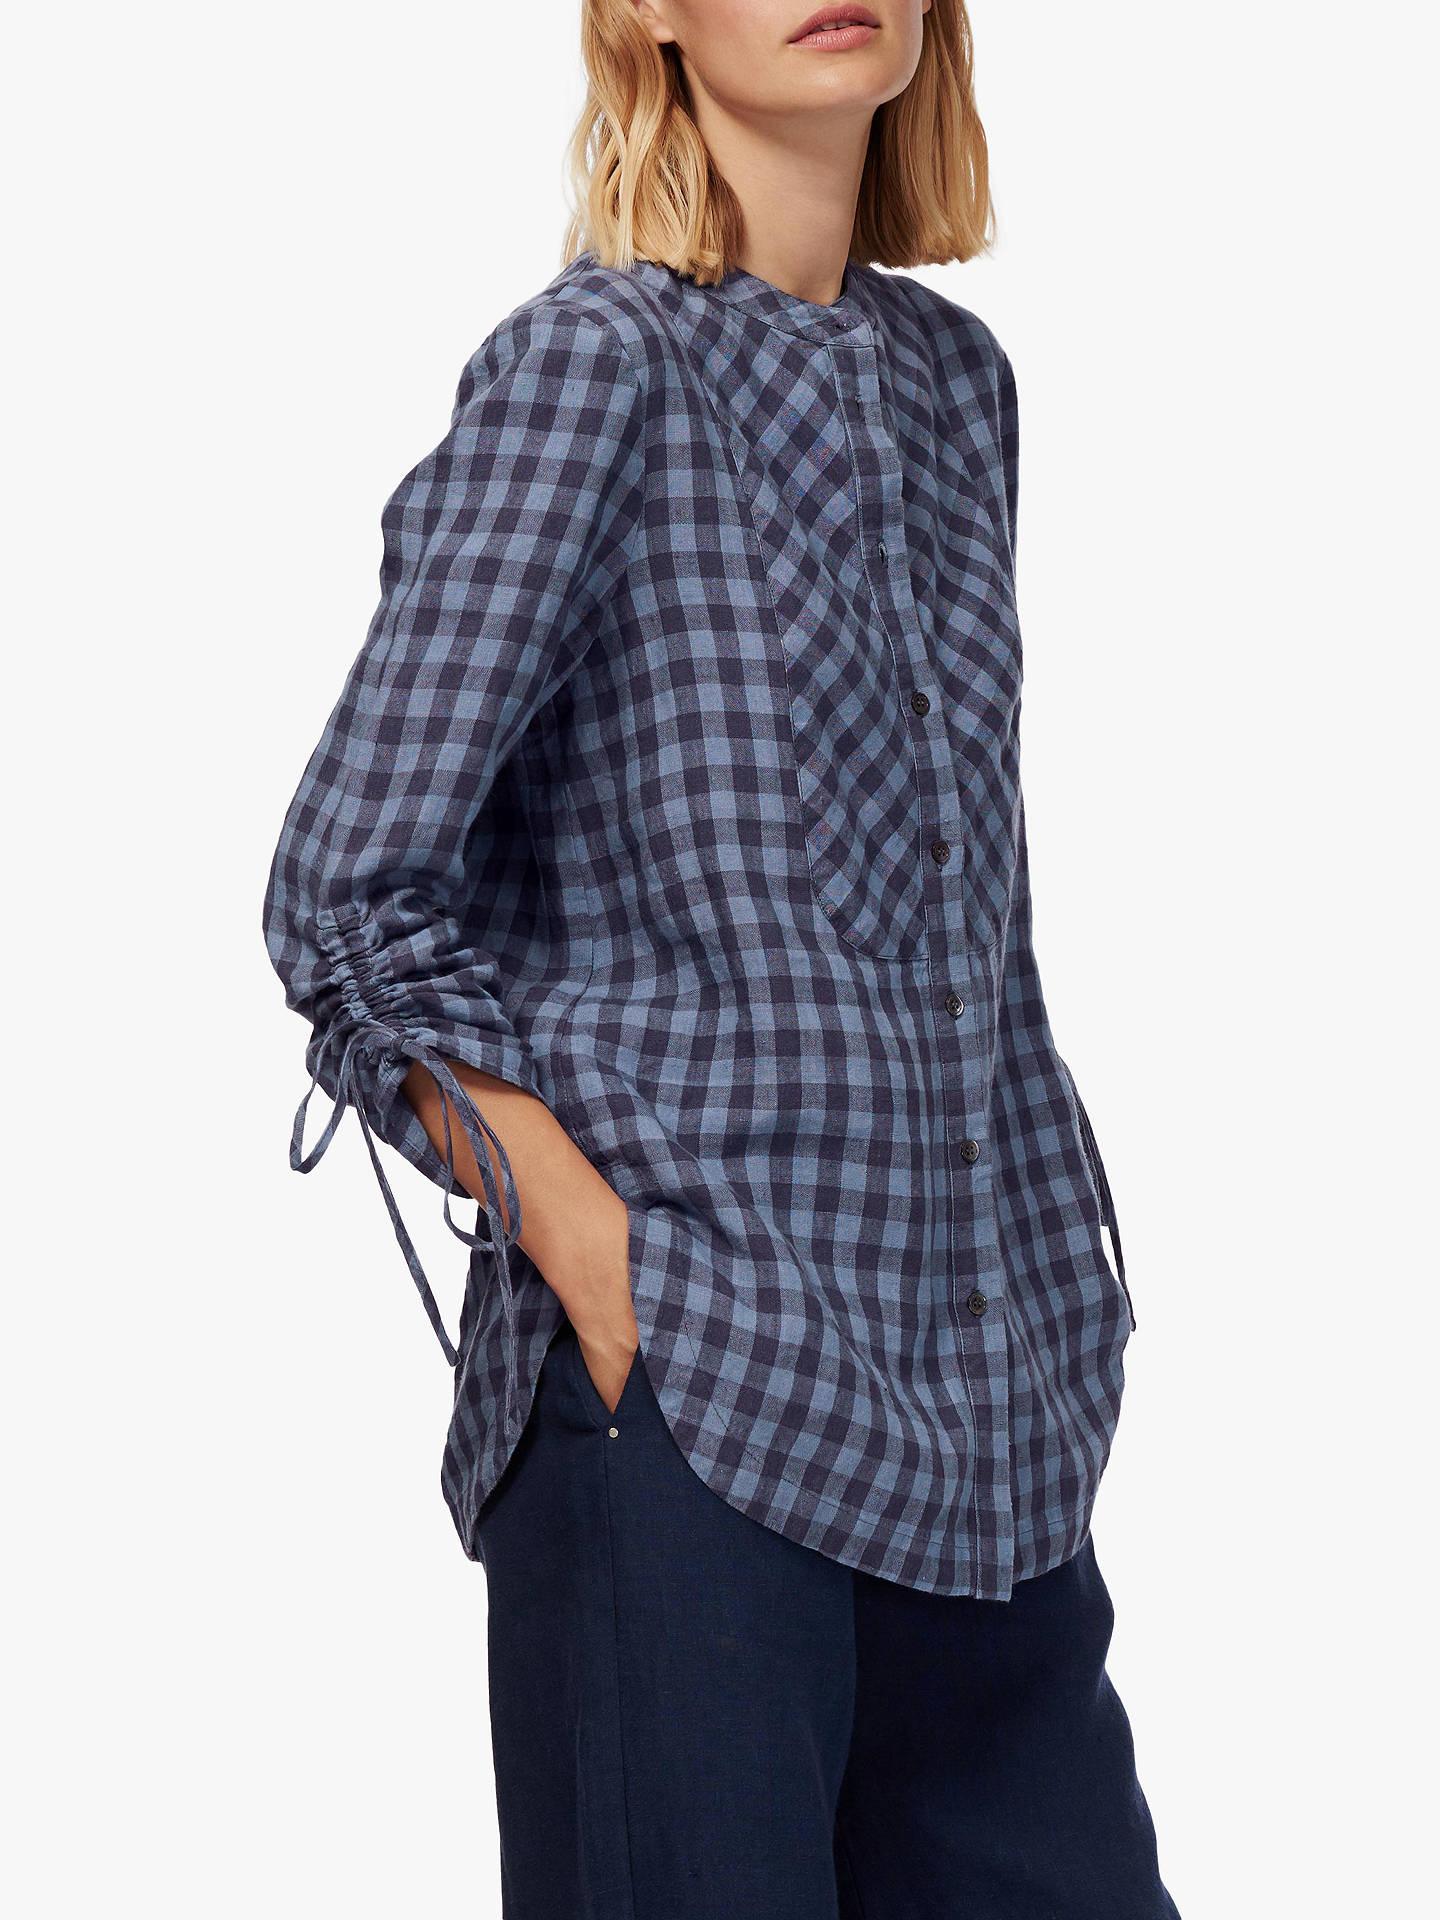 6e35ad04889 Buy Brora Gingham Linen Tunic